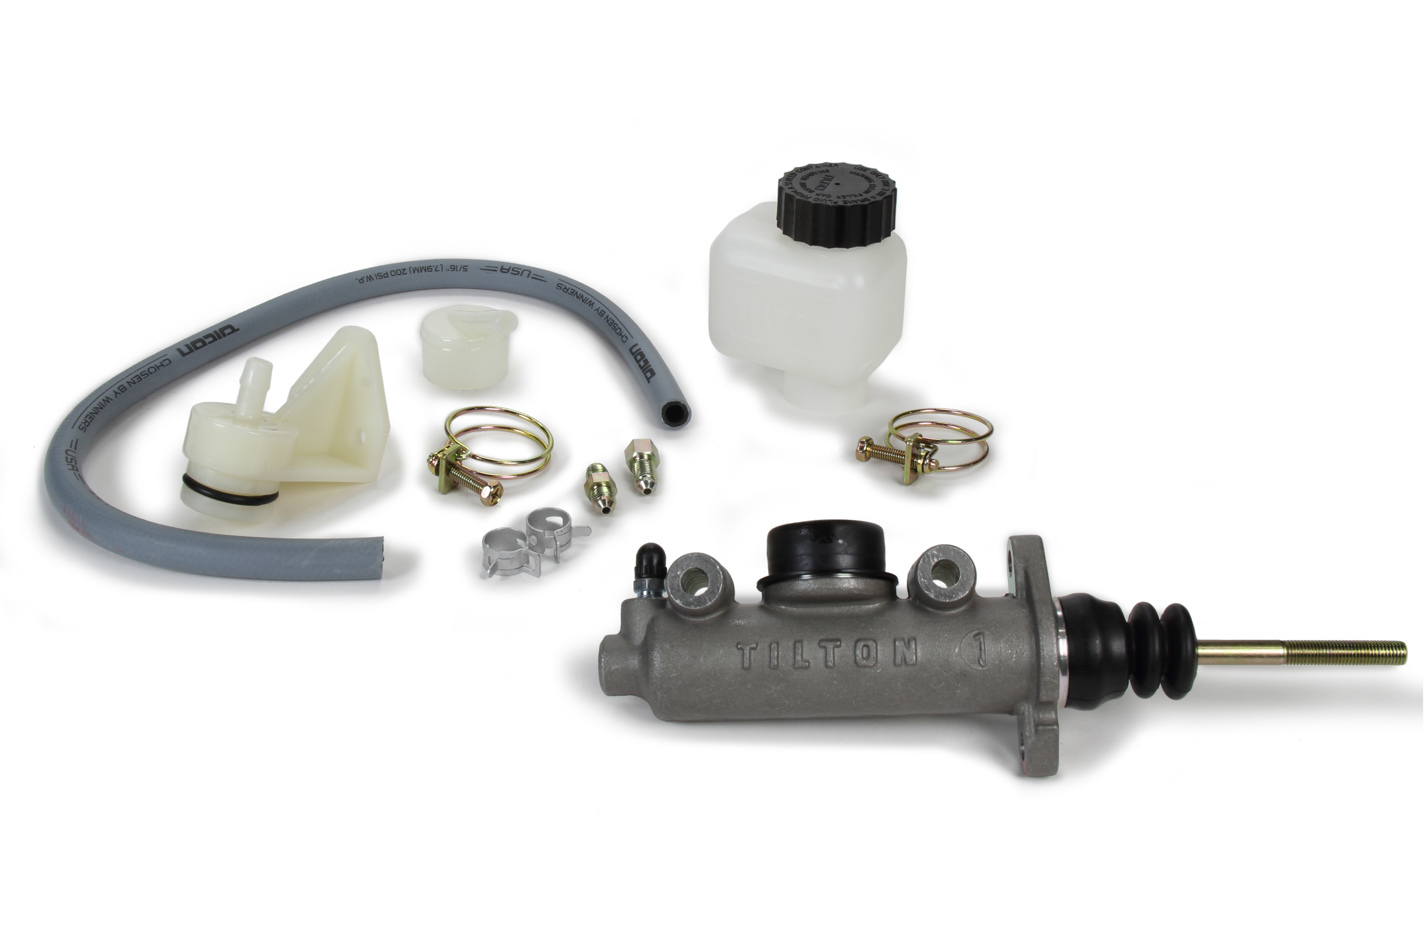 1in Master Cylinder Kit